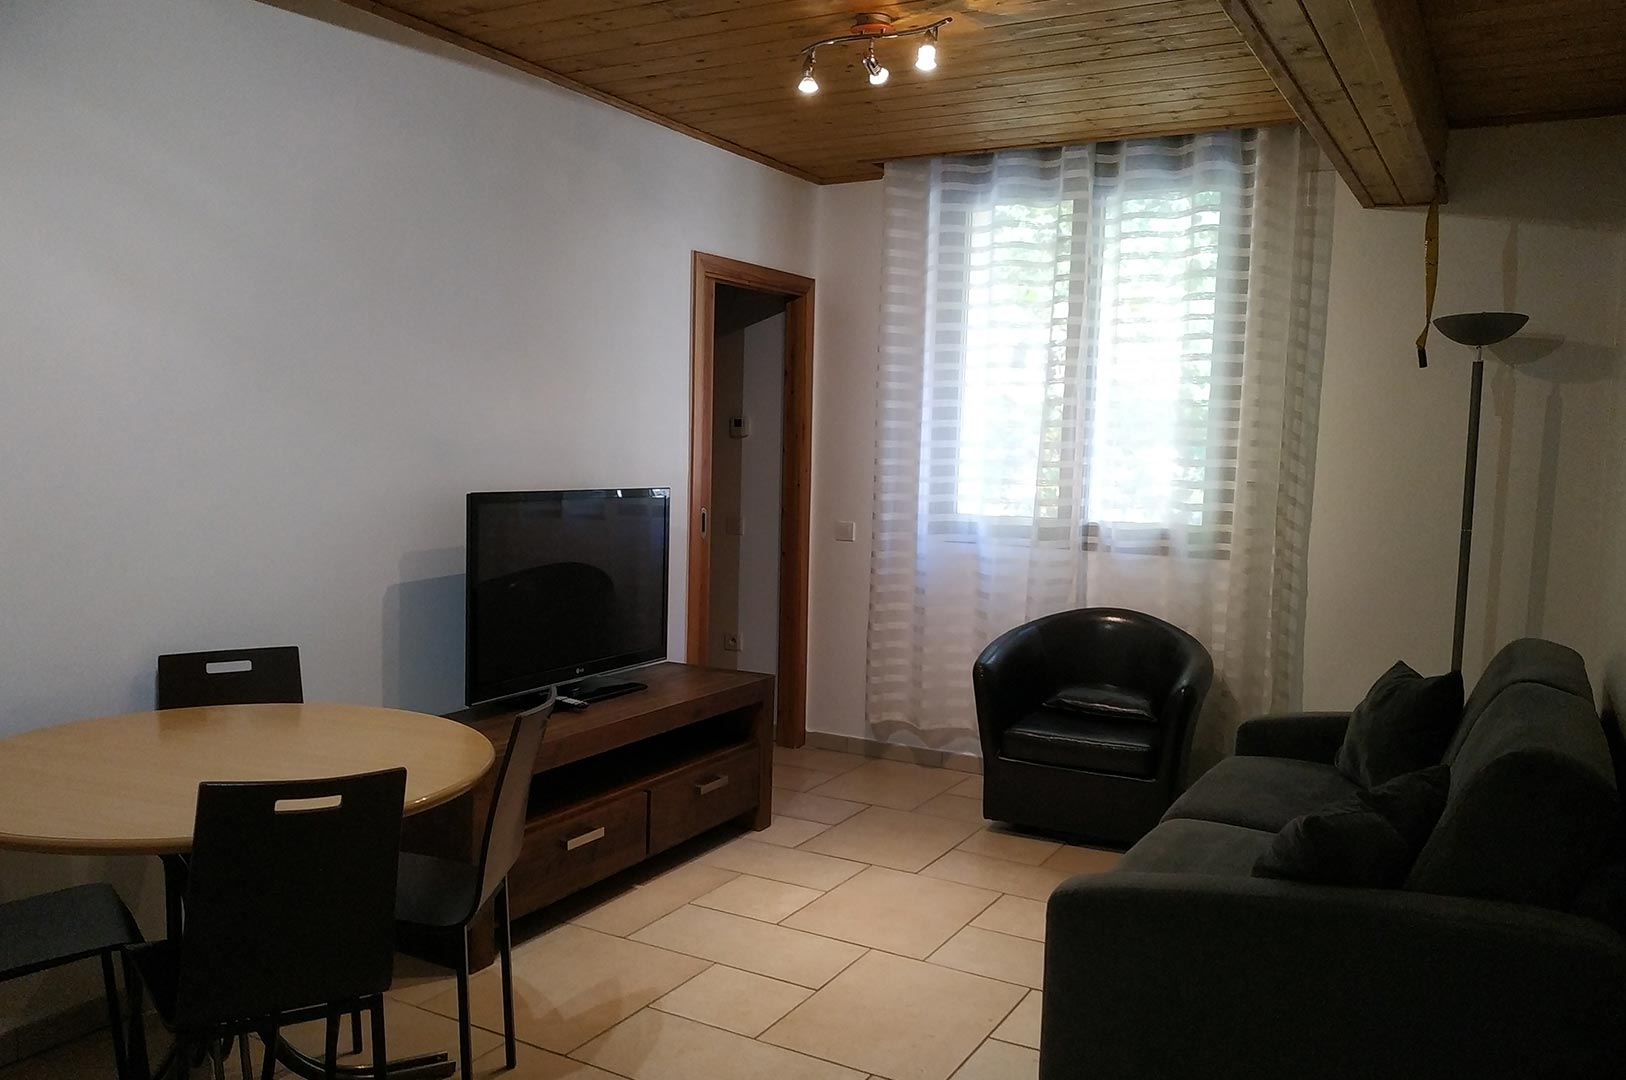 Apartemento Le Carlit